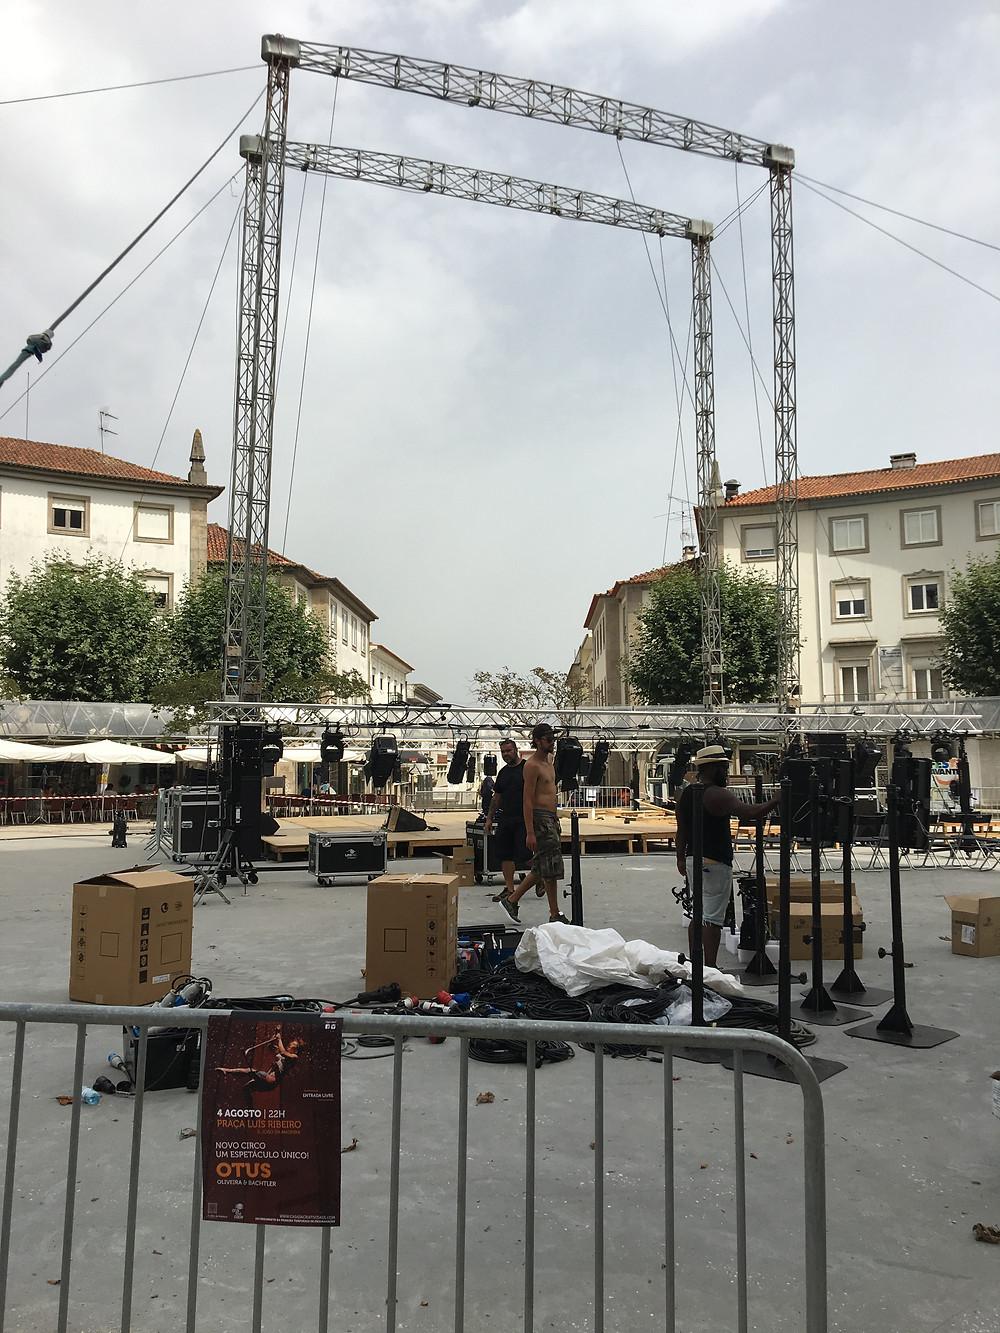 Oliveira & Bachtler present OTUS at Praça Luis Ribeiro in São João da Madeira this Saturday, August 4th at 10pm!